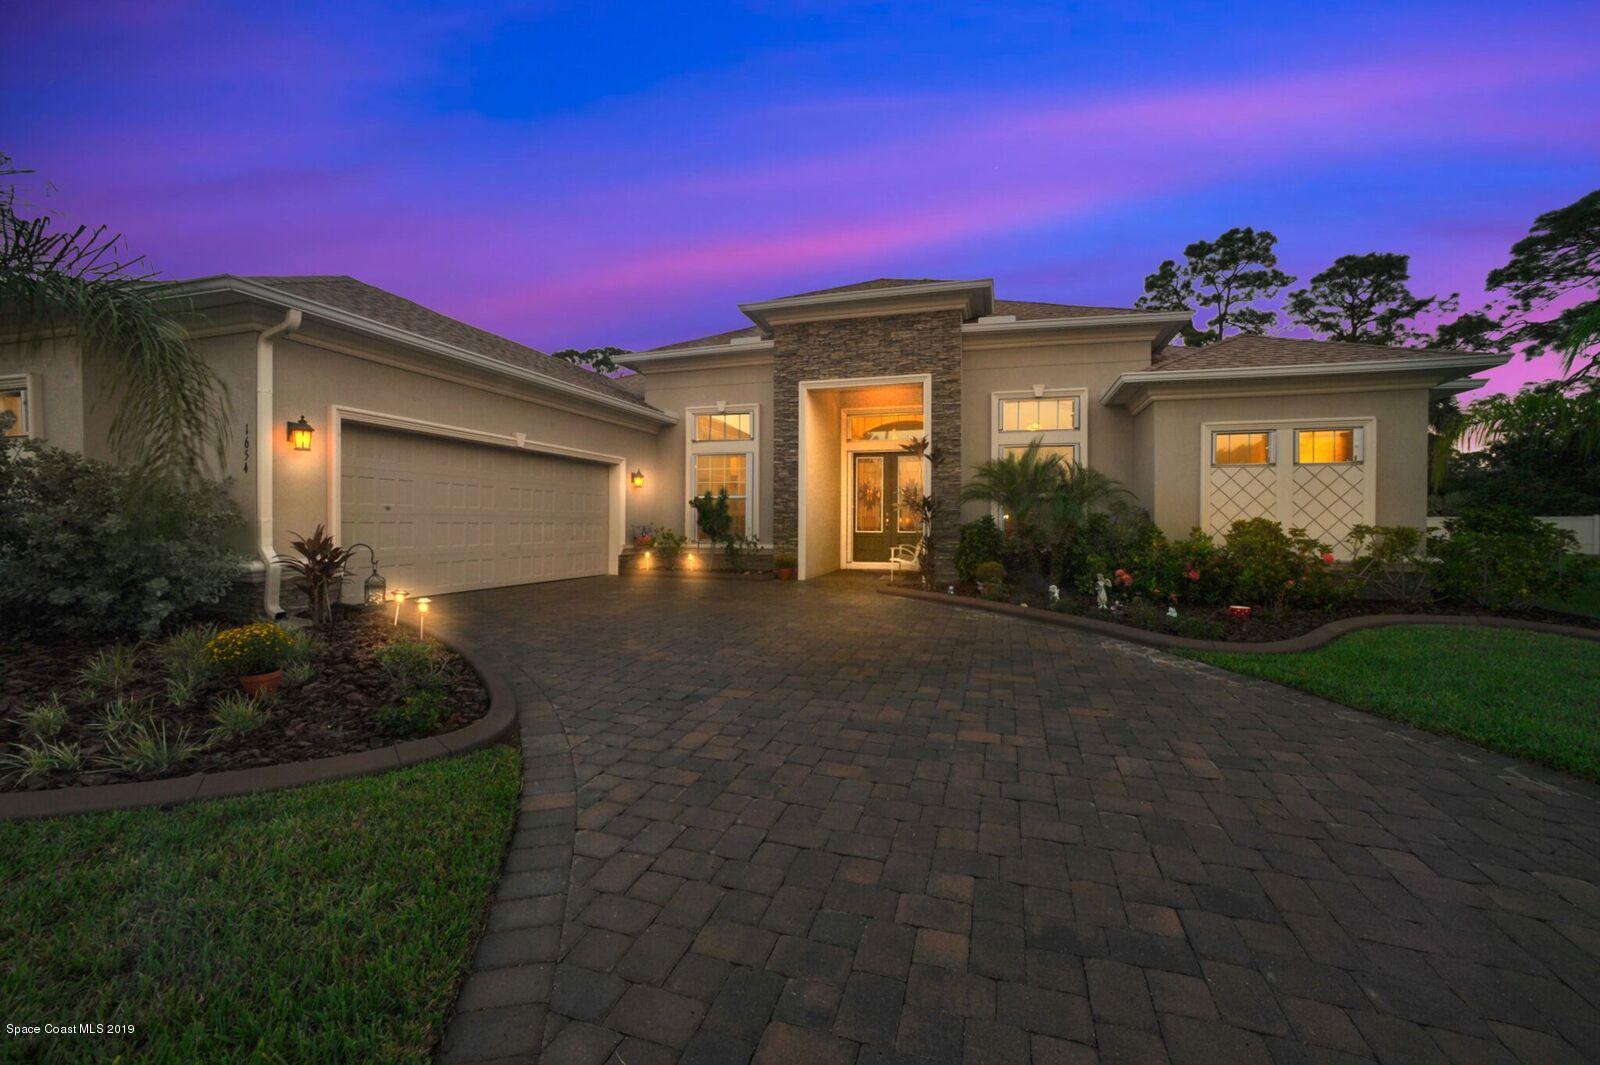 Veranda Place Homes For Sale Melbourne Fl Real Estate Listings